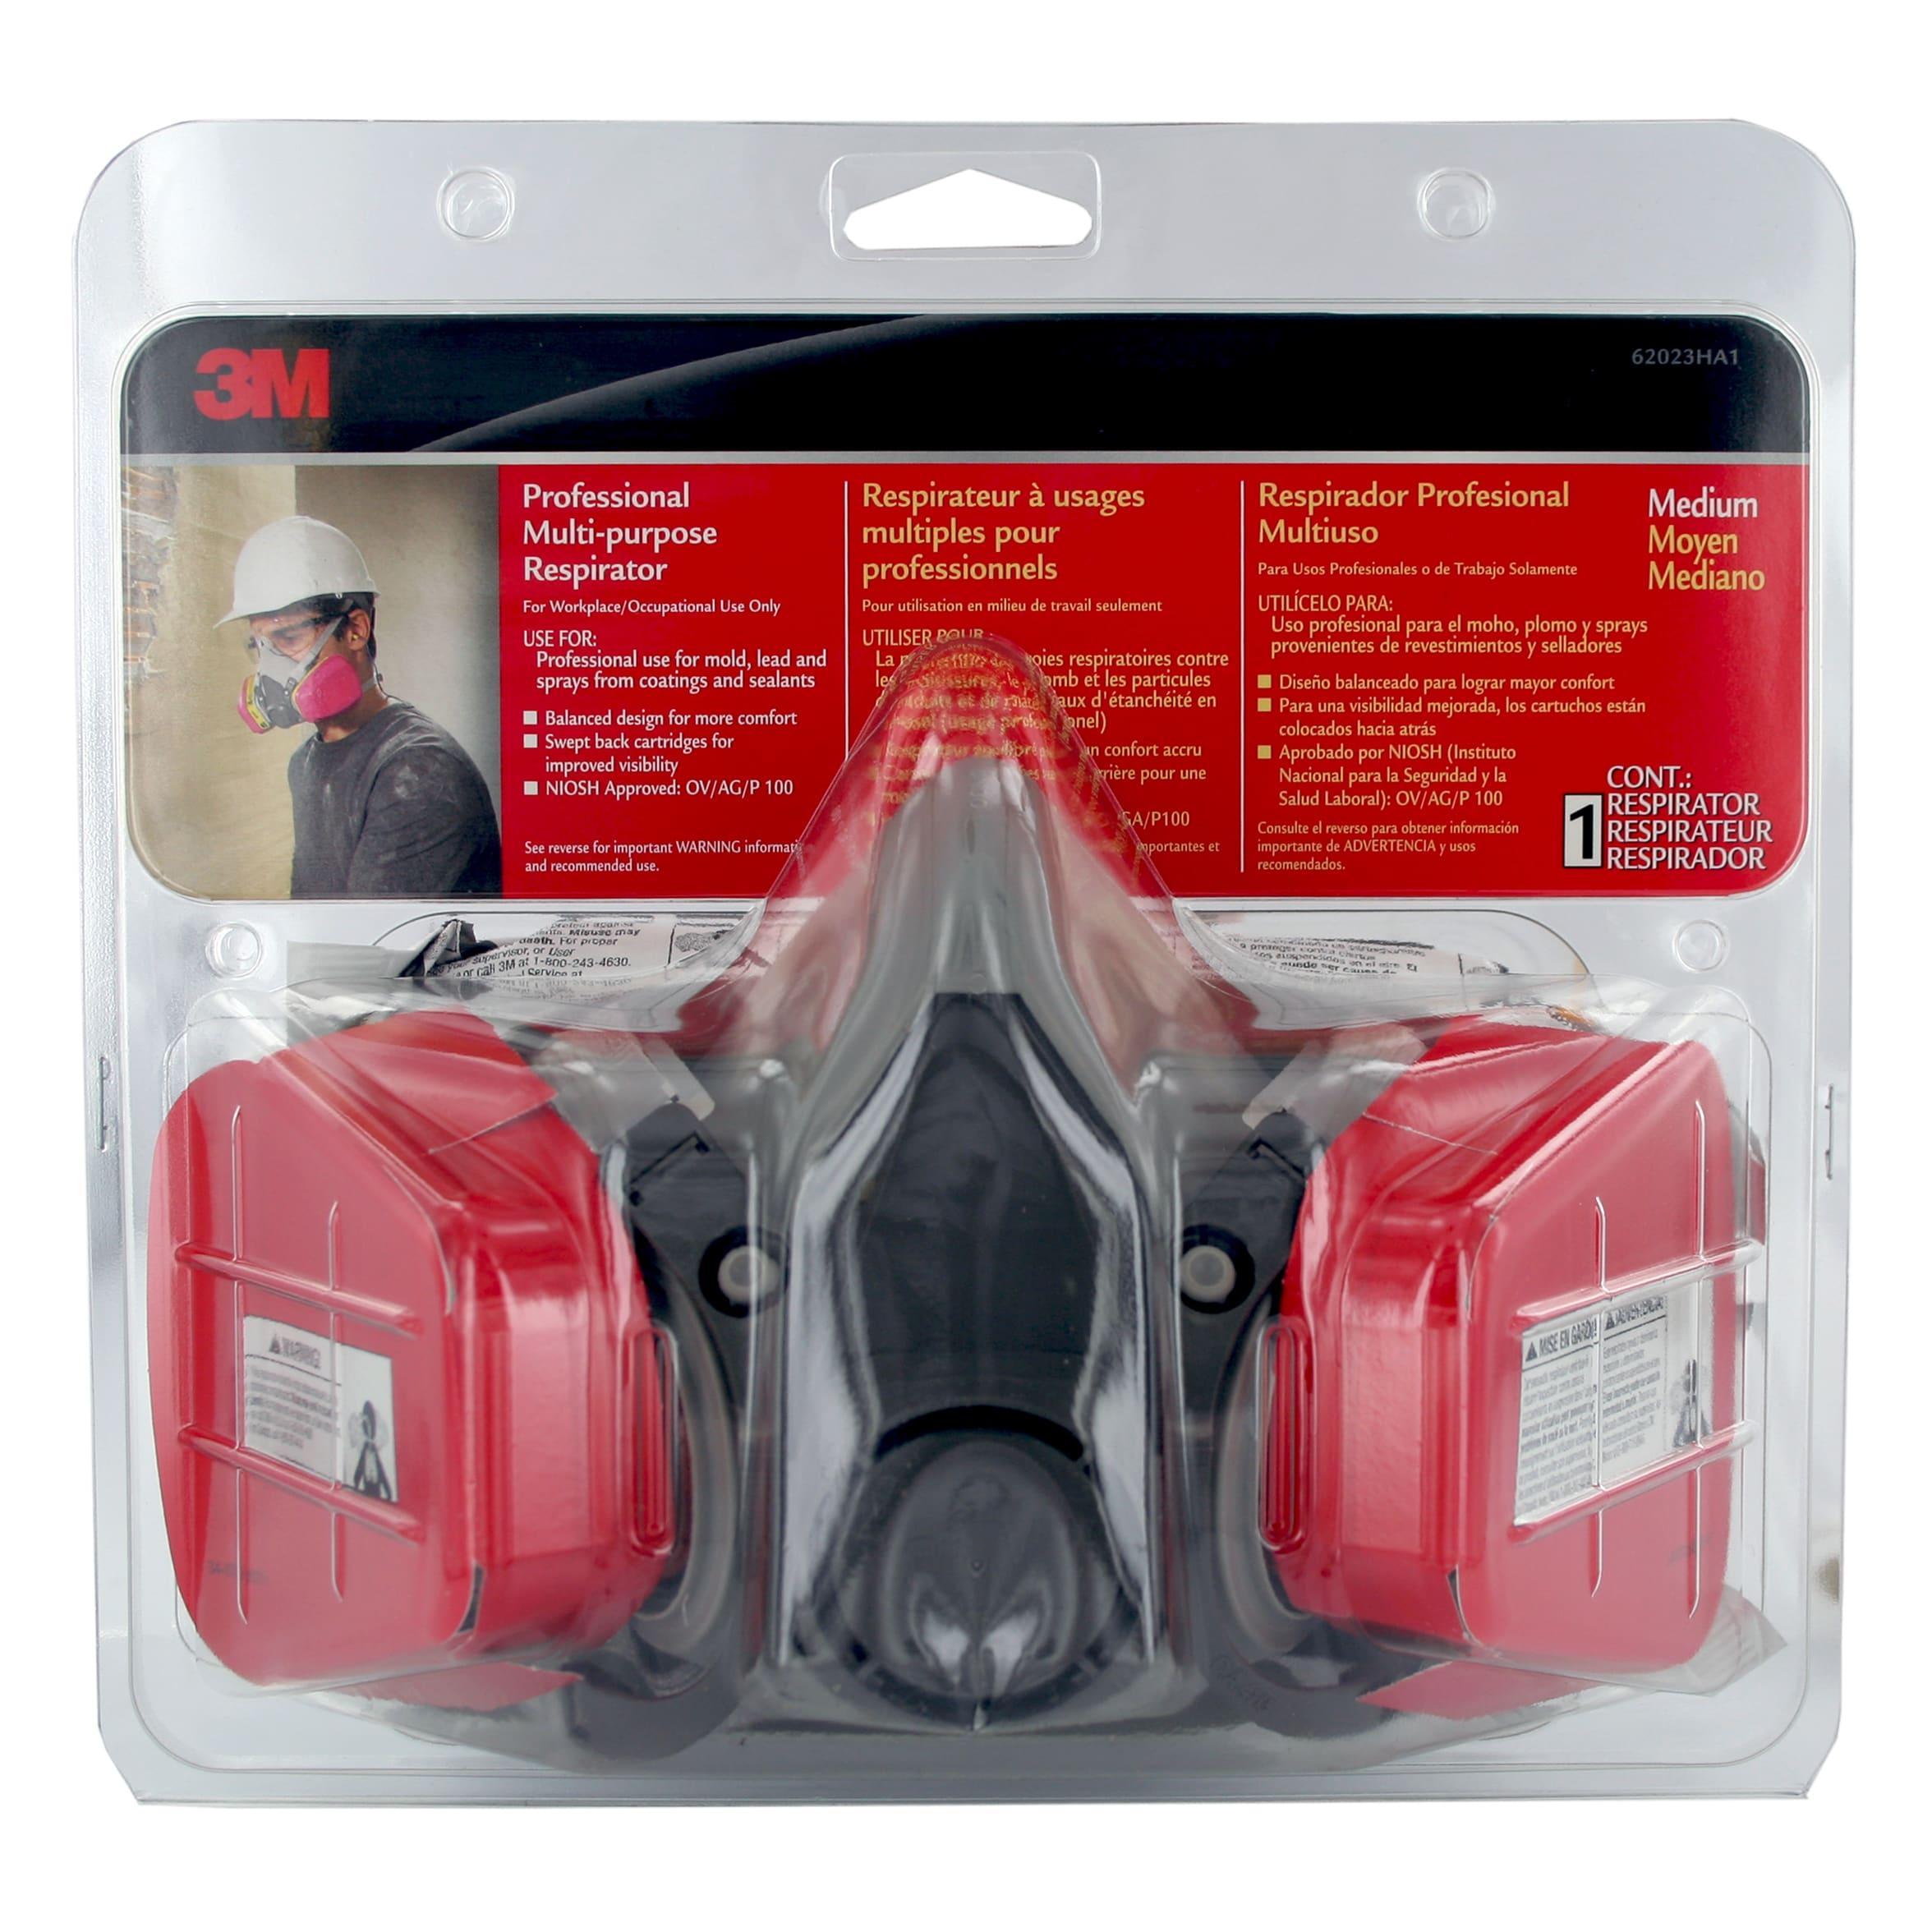 3M Tekk Protection Multi-purpose Respirator (MMM62023HA1C)